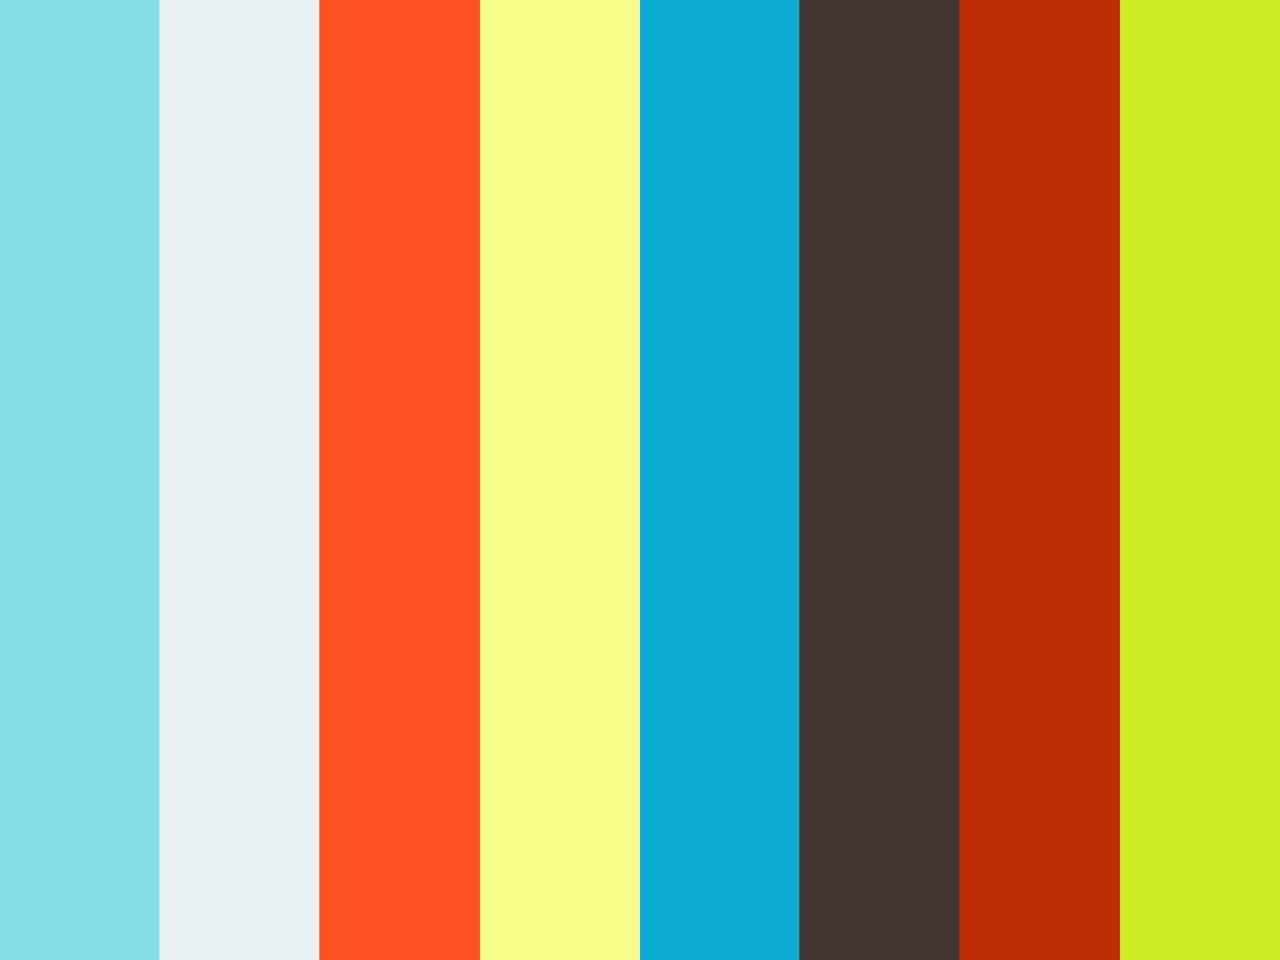 002766 - PROG - TV Provincie - 7de groepsaankoop Groene stroom en aardgas